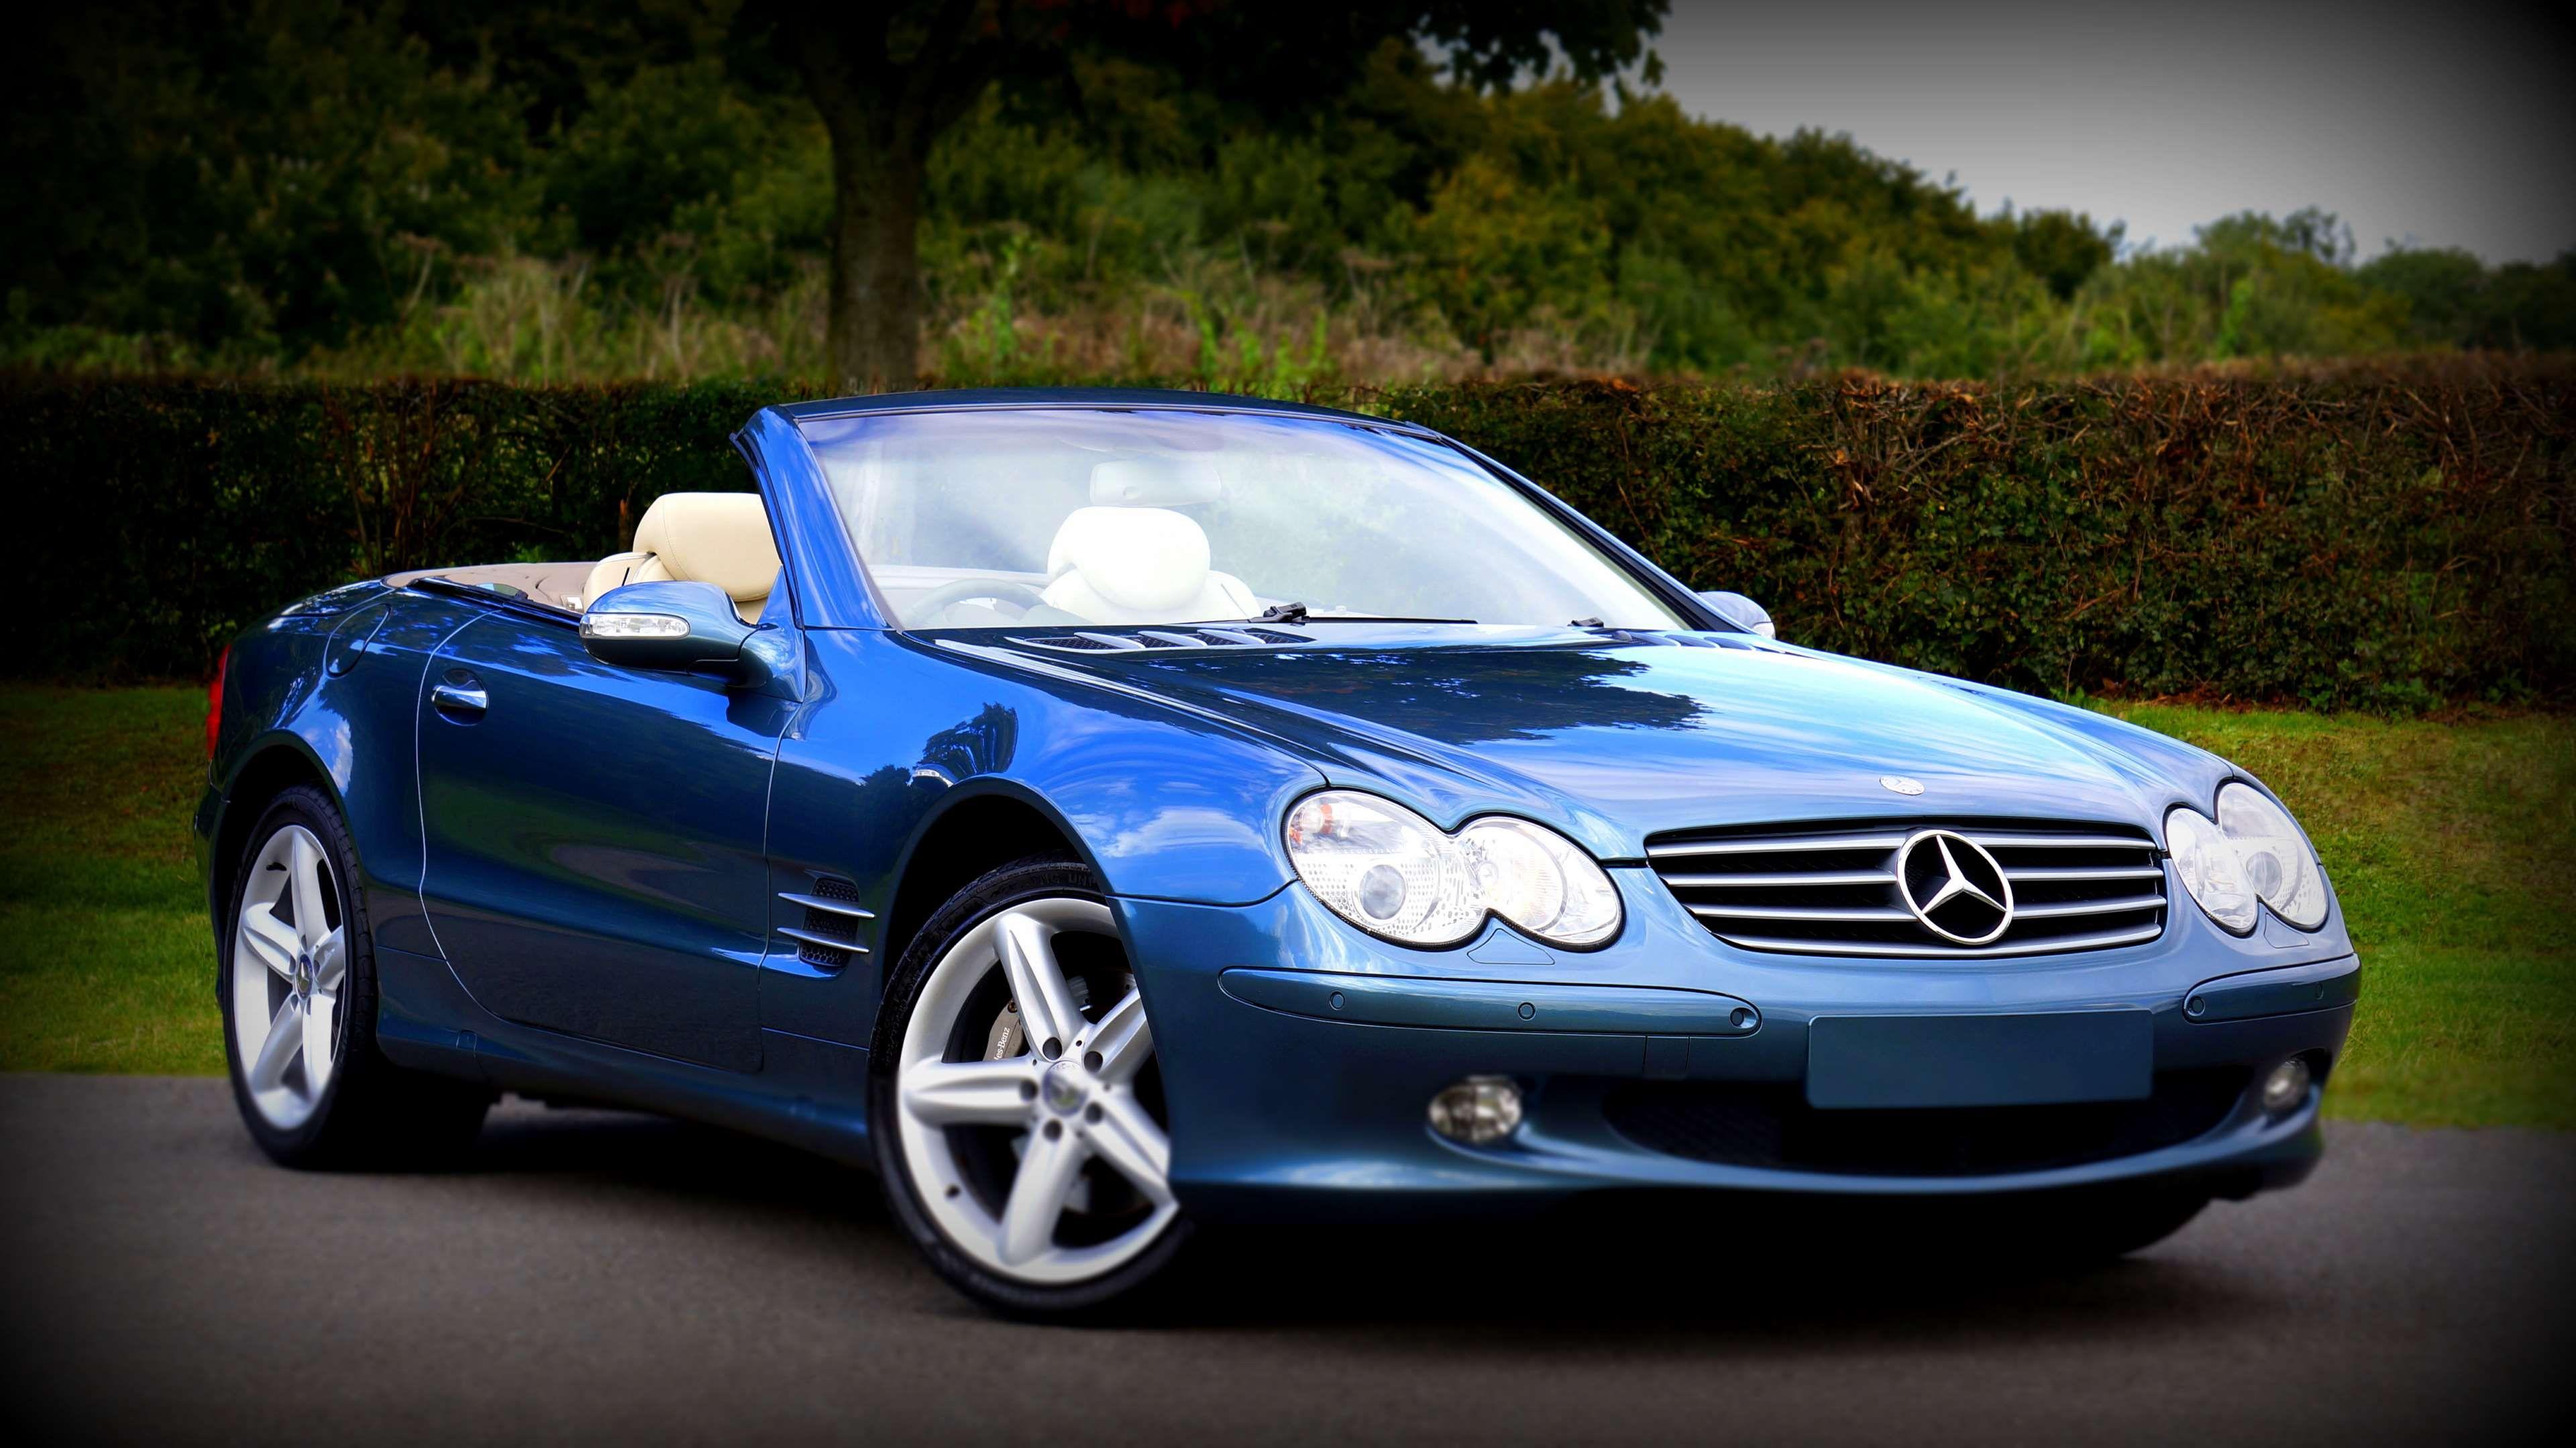 #blue #car #class #classic car #convertible #fast #mercedes benz #sl500 #speed #…